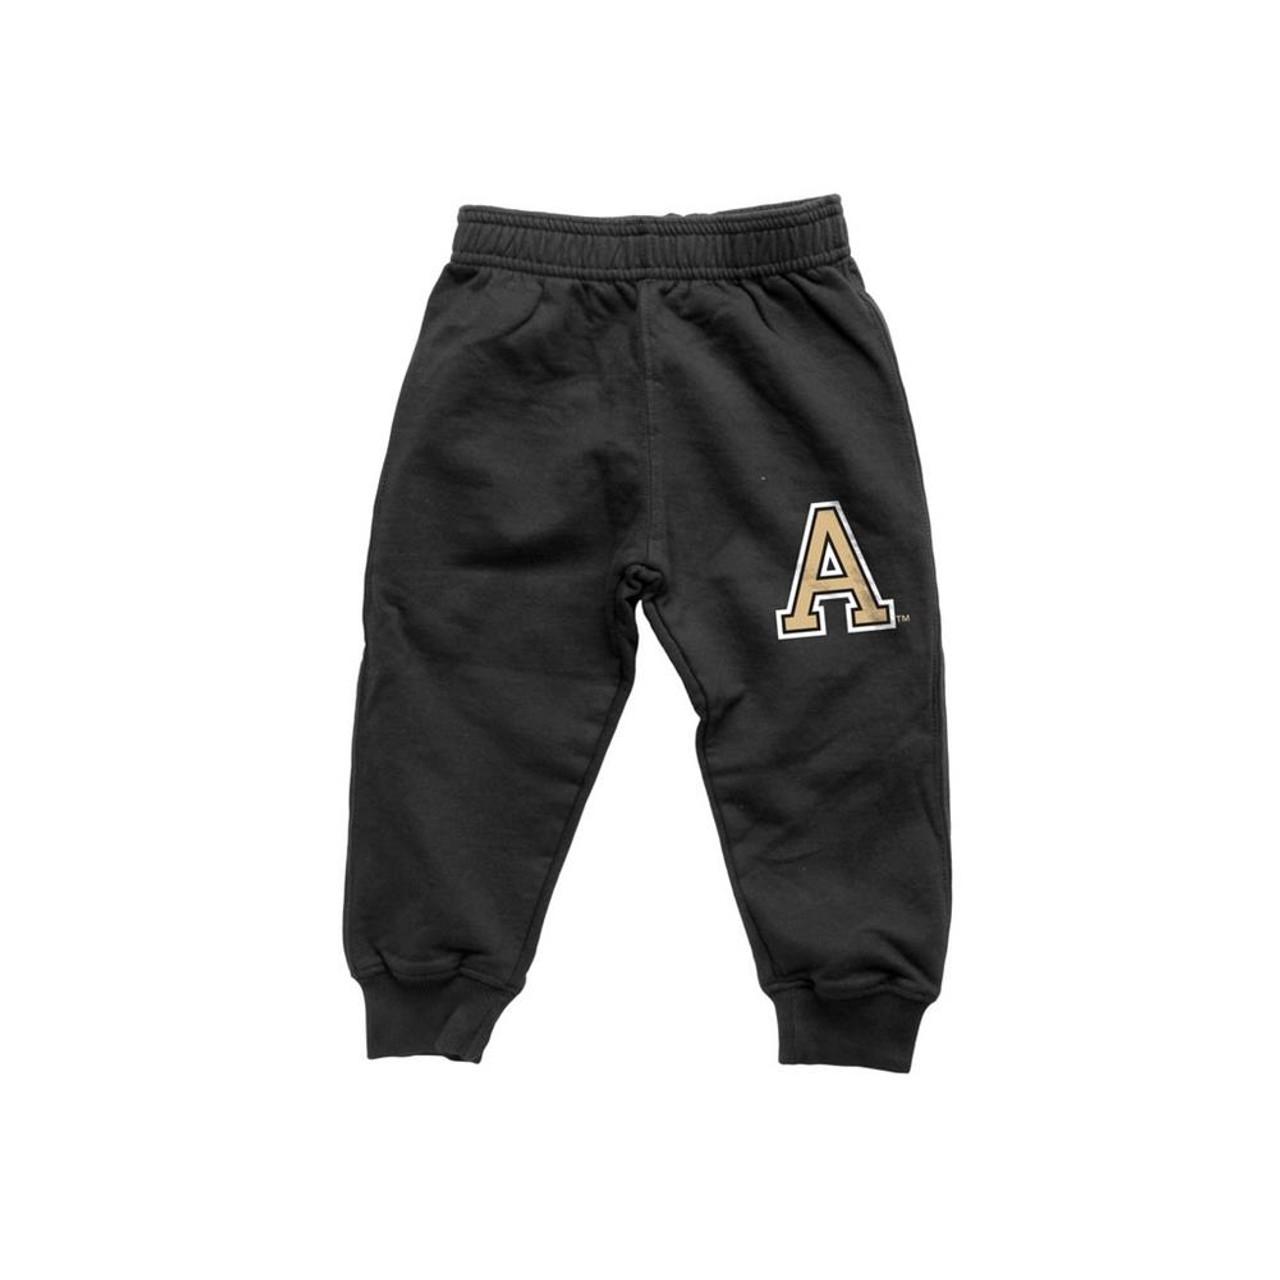 Infant/Toddler Raglan Army Black Knights Hoodie and Pant Set